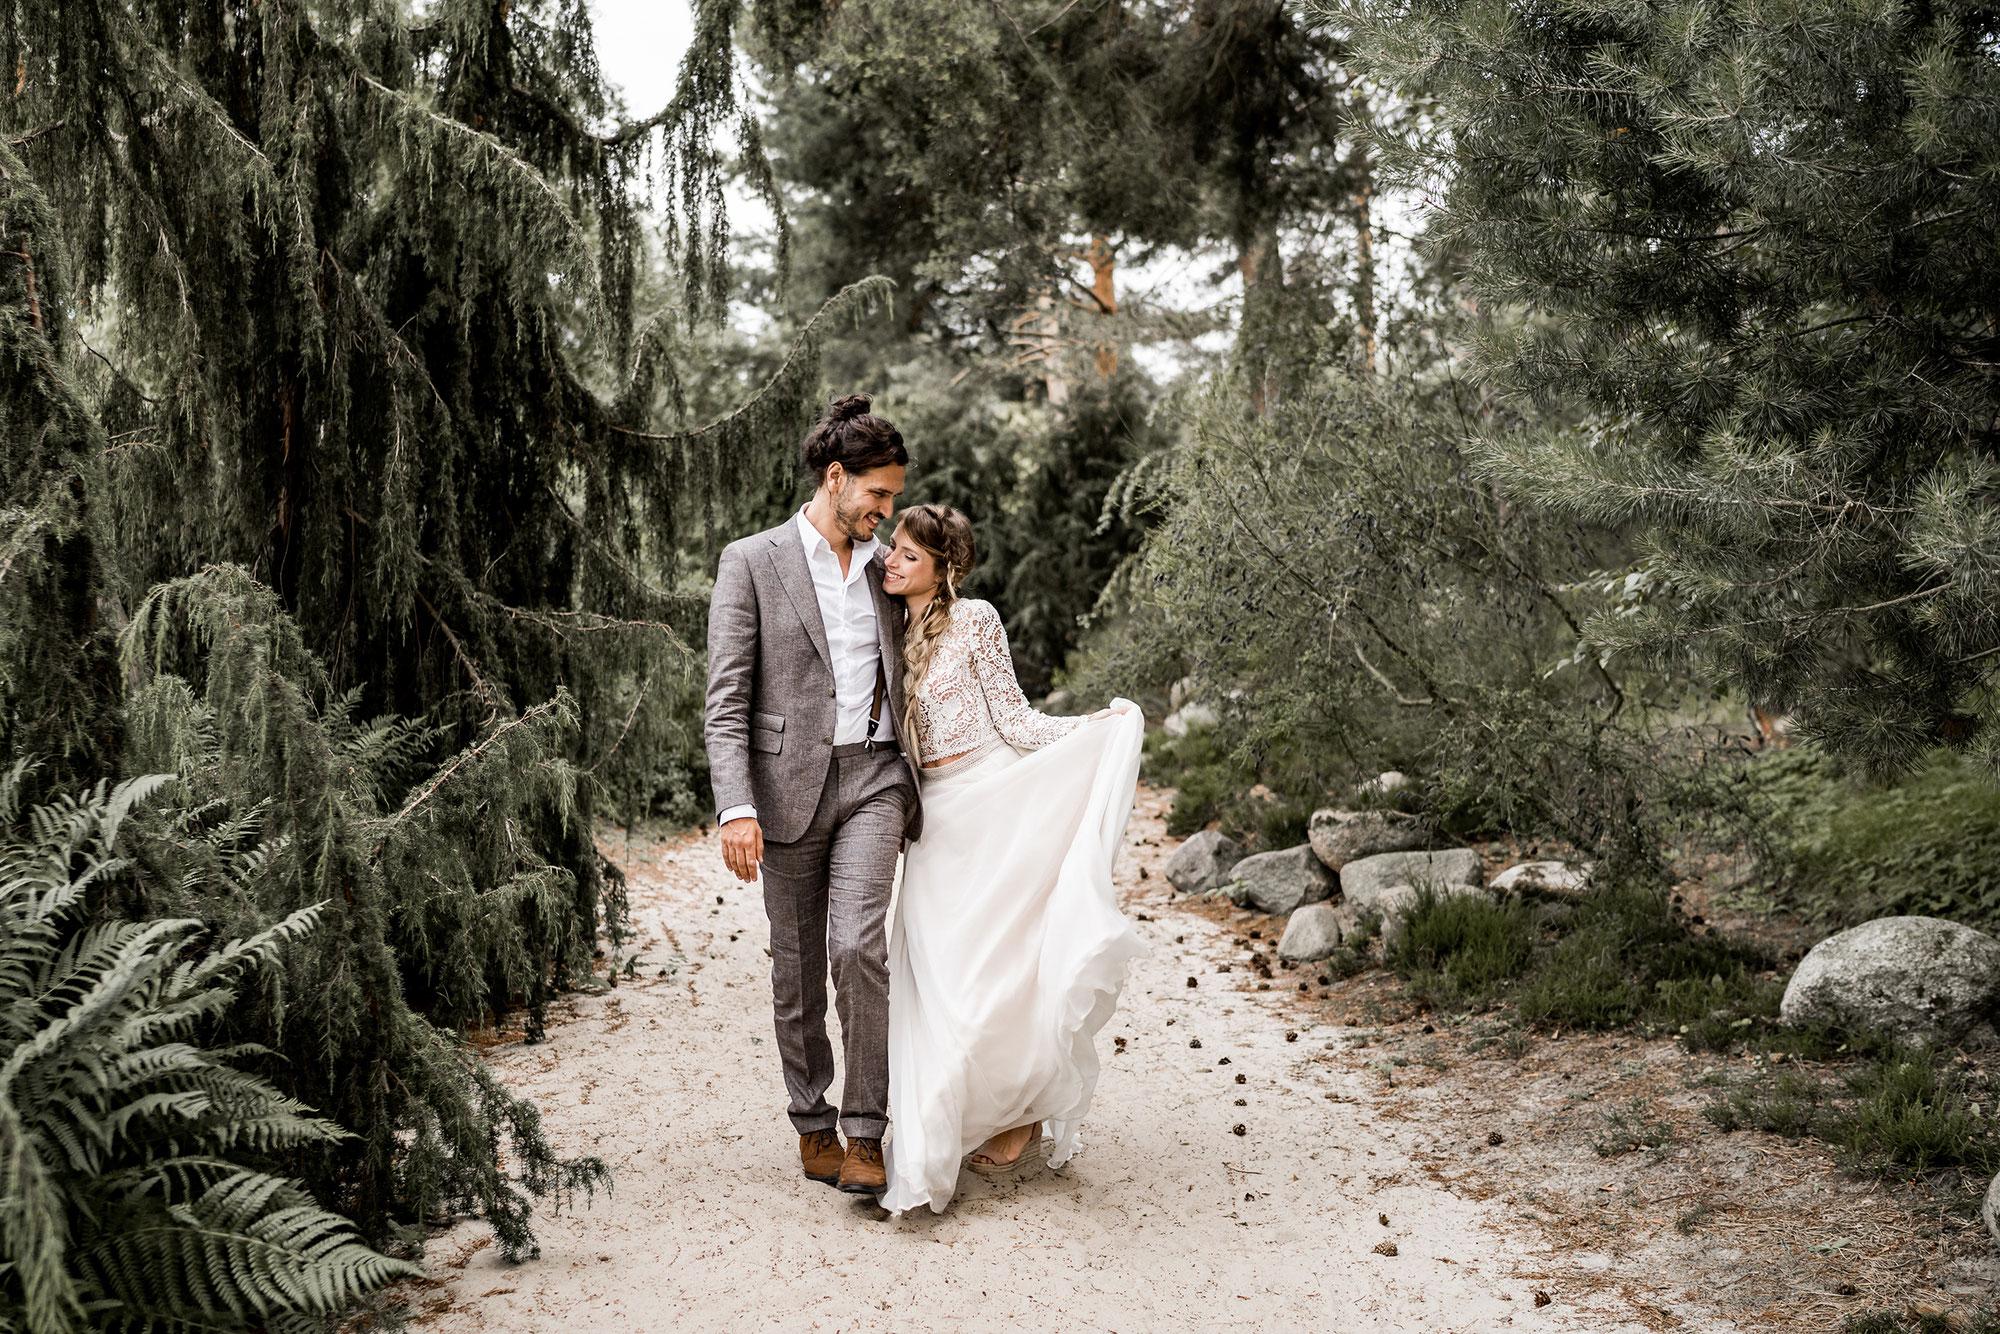 Jessi & Rek - After Wedding Inspiration im Rombergpark Dortmund